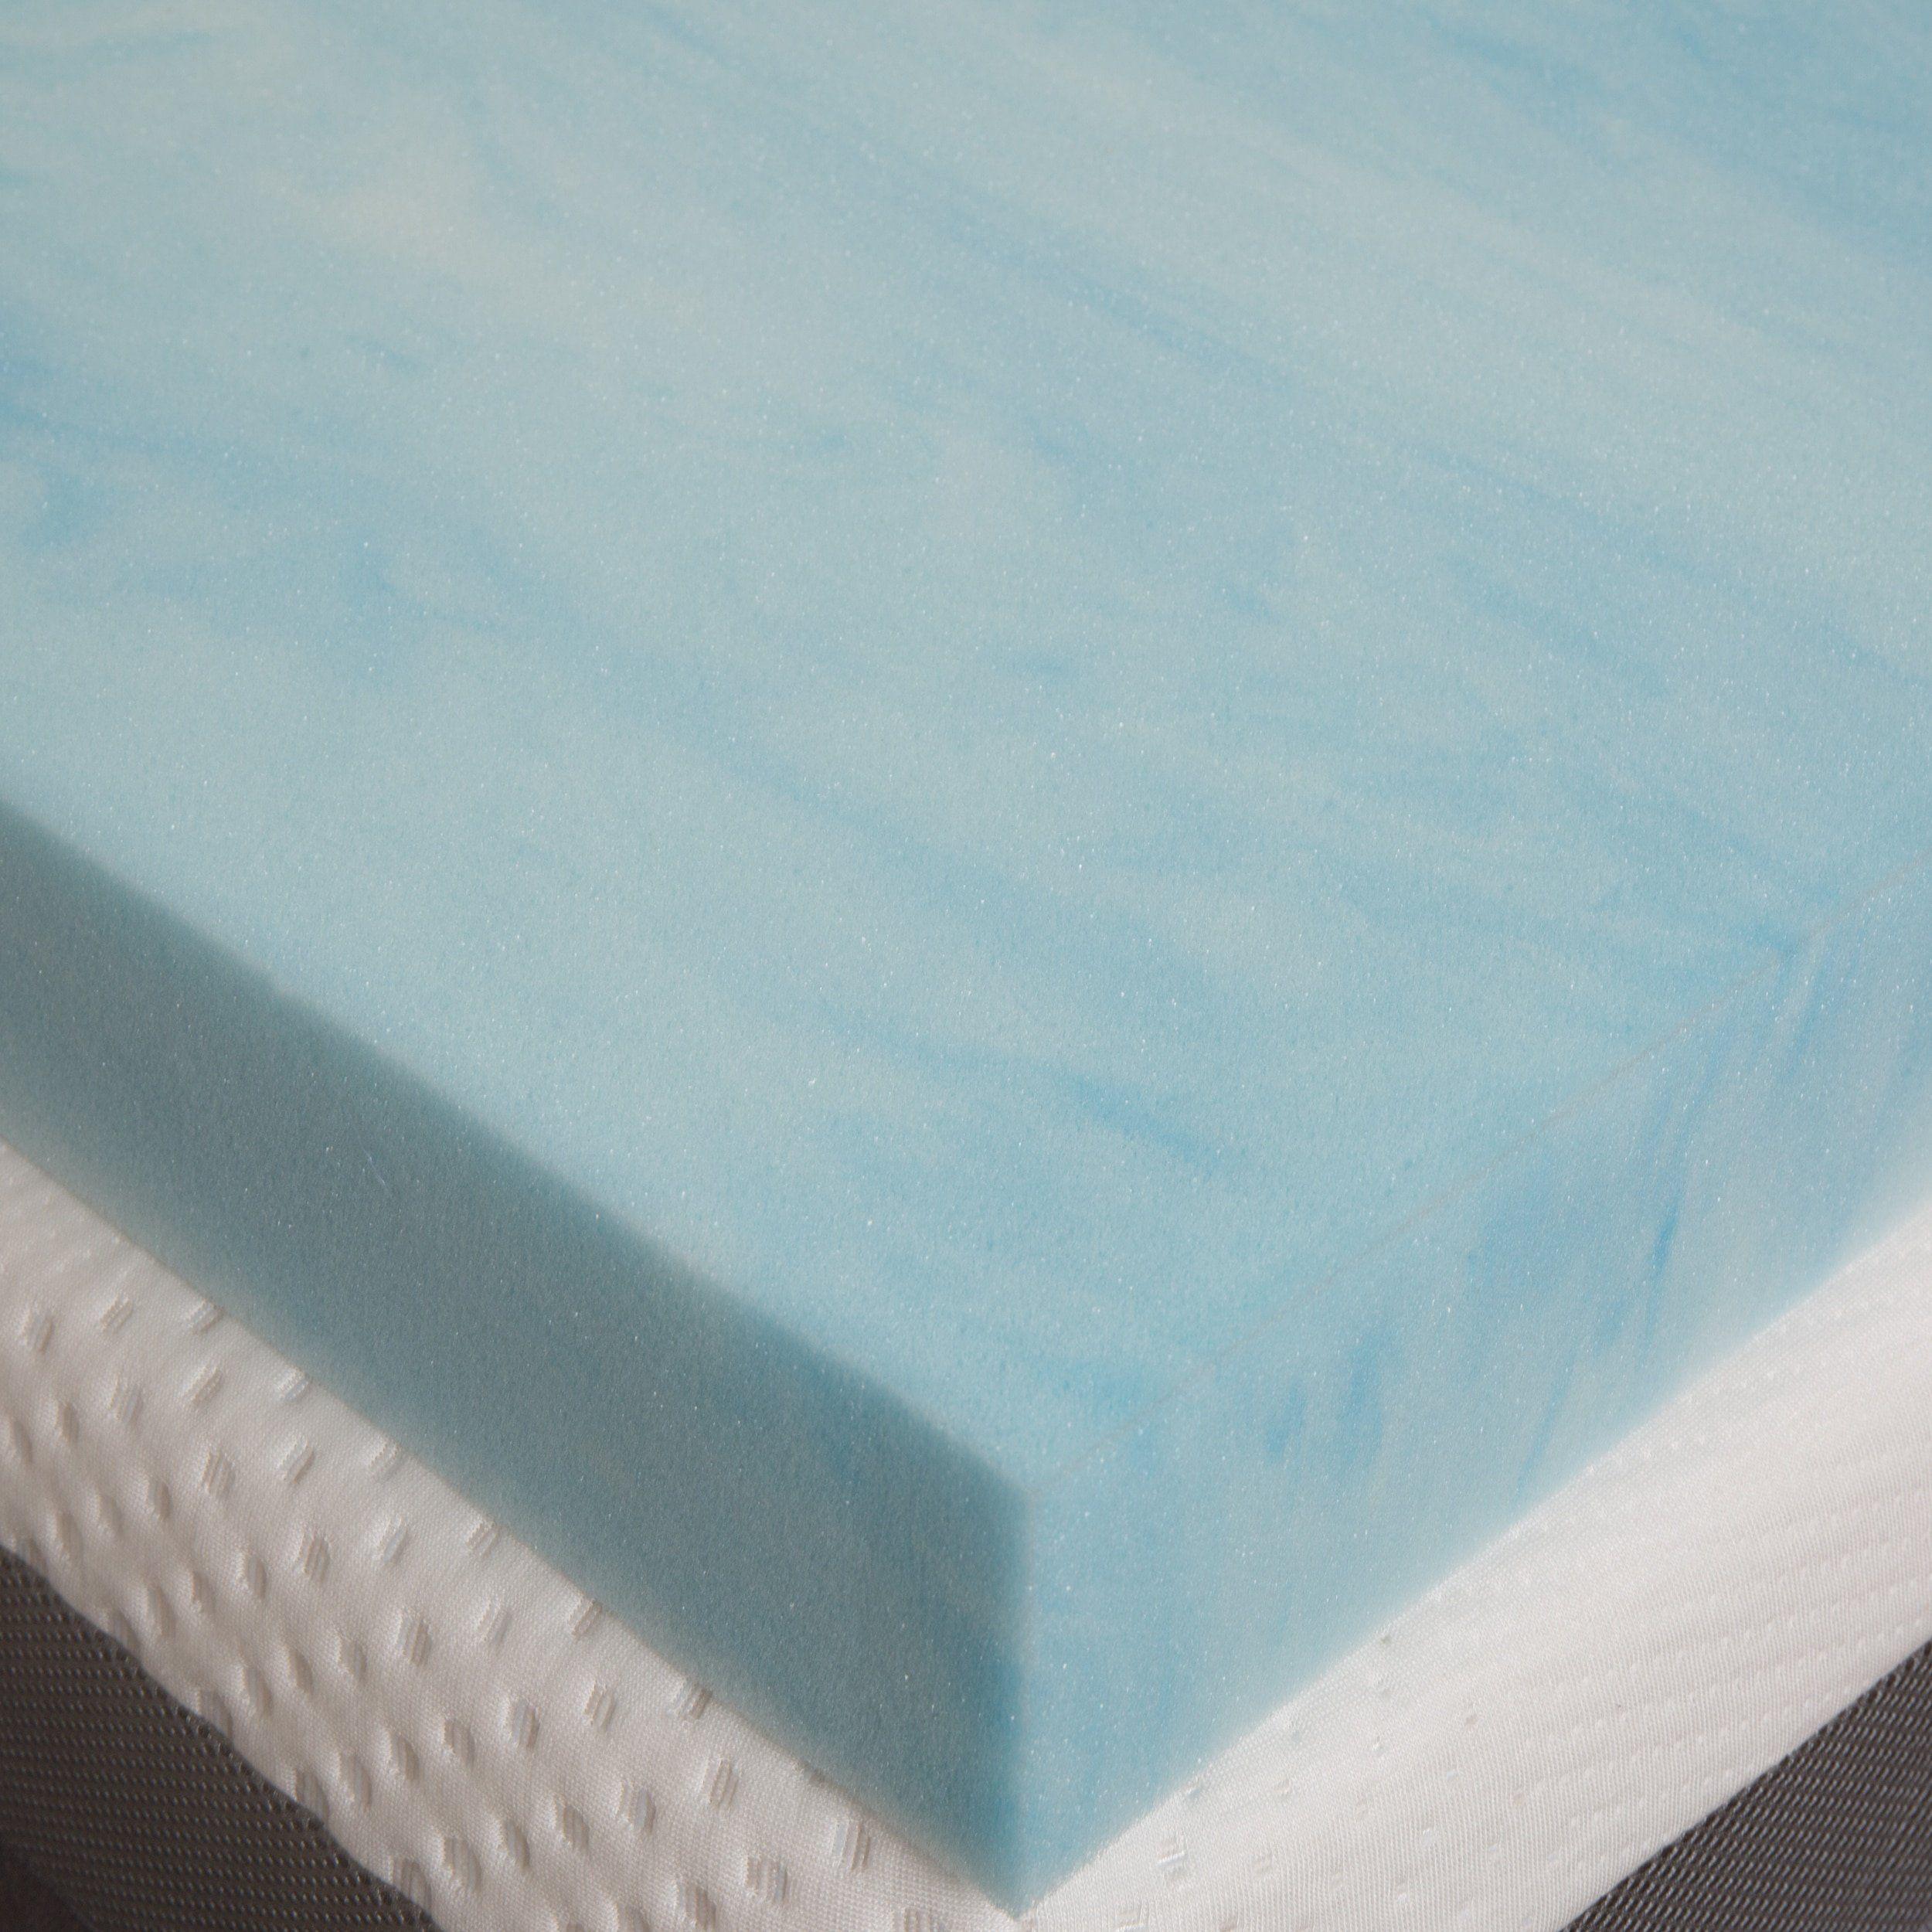 slumber solutions choose your comfort 4inch gel memory foam mattress